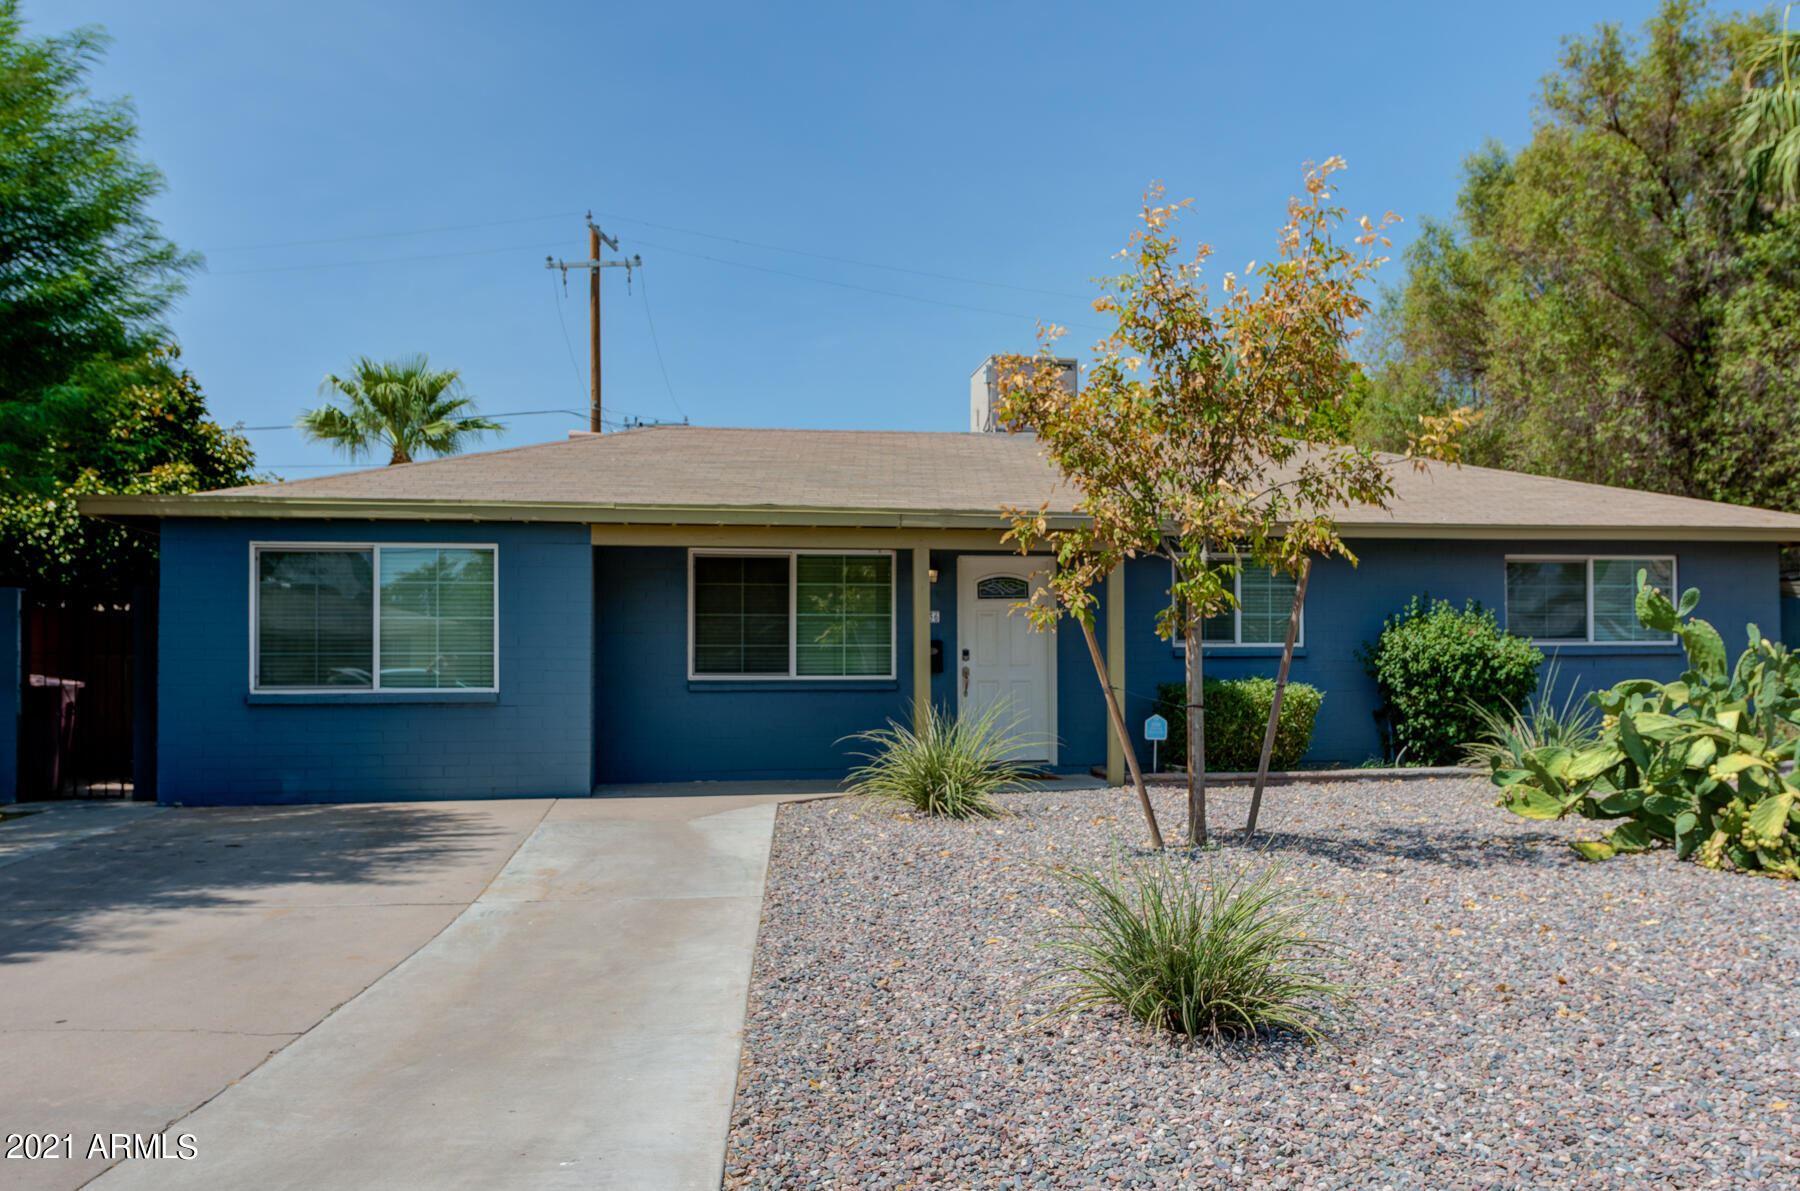 6536 E 5TH Street, Scottsdale, AZ 85251 - MLS#: 6228696